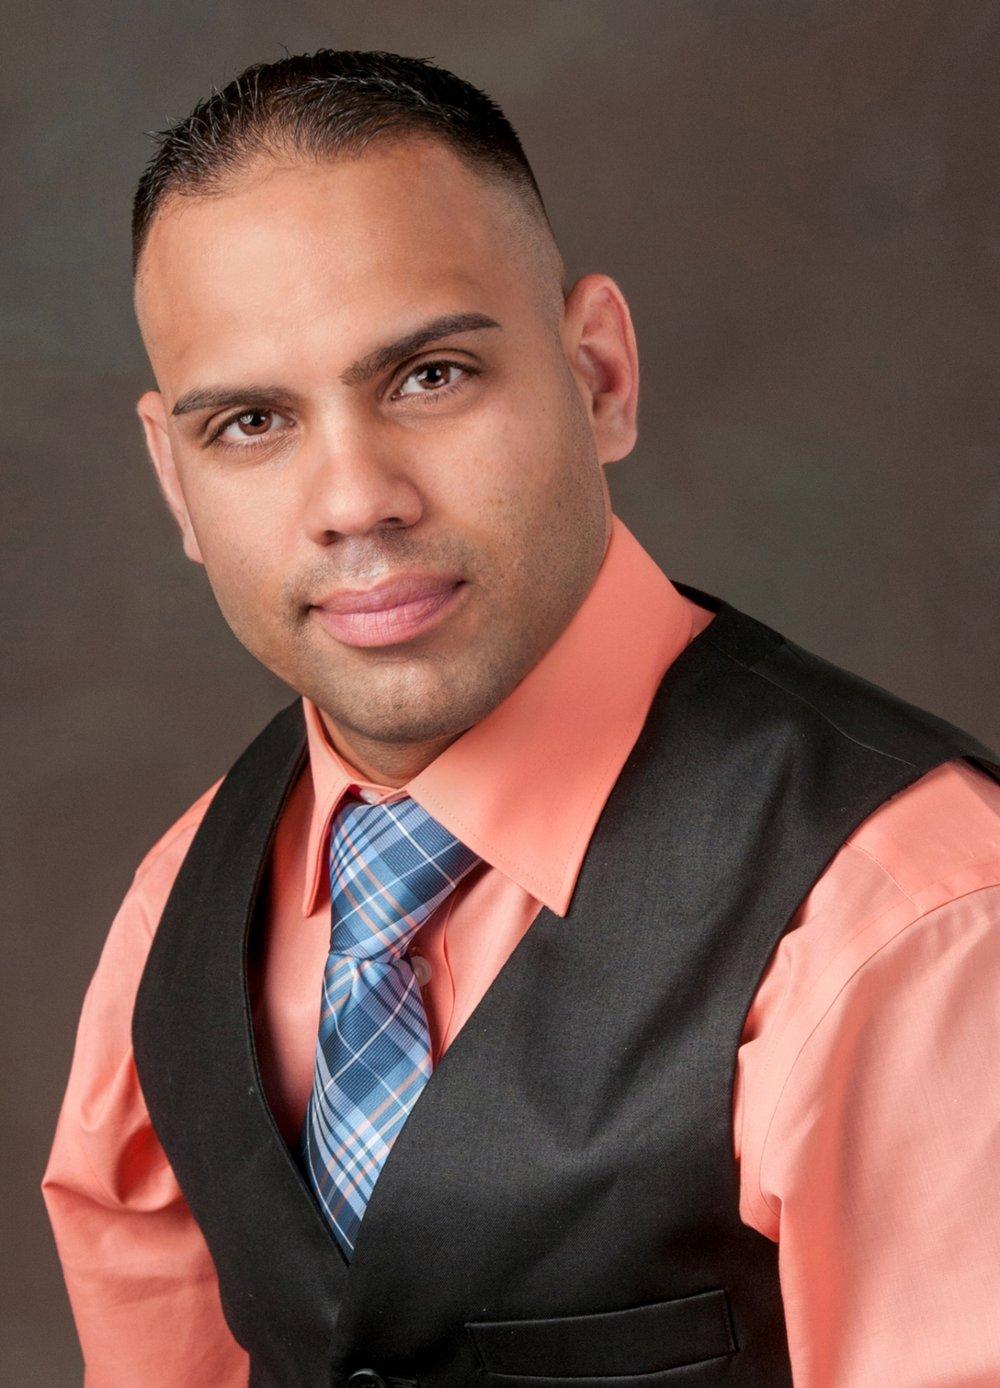 Jonathan Soto   Multi-Media Specialist  Phone: (352) 368-6718  jsoto@marionso.com